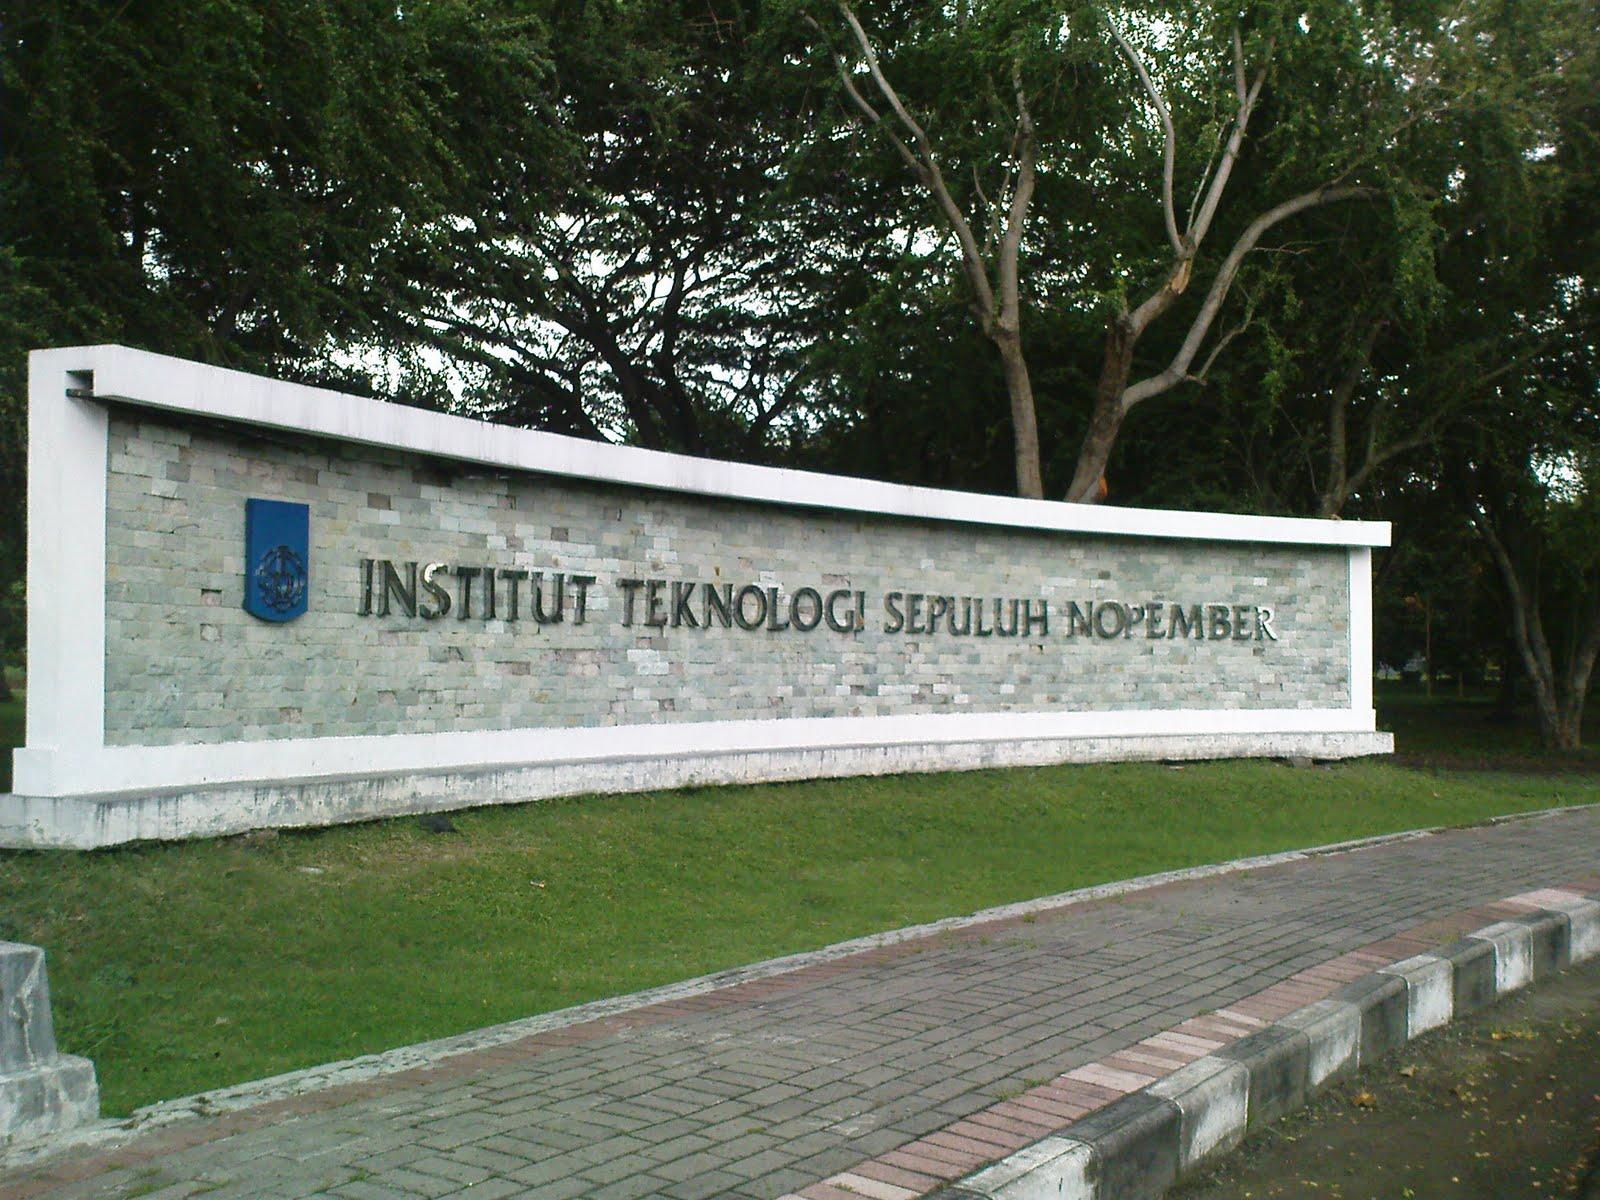 Pendaftaran Institut Teknologi Sepuluh November (ITS) Surabaya